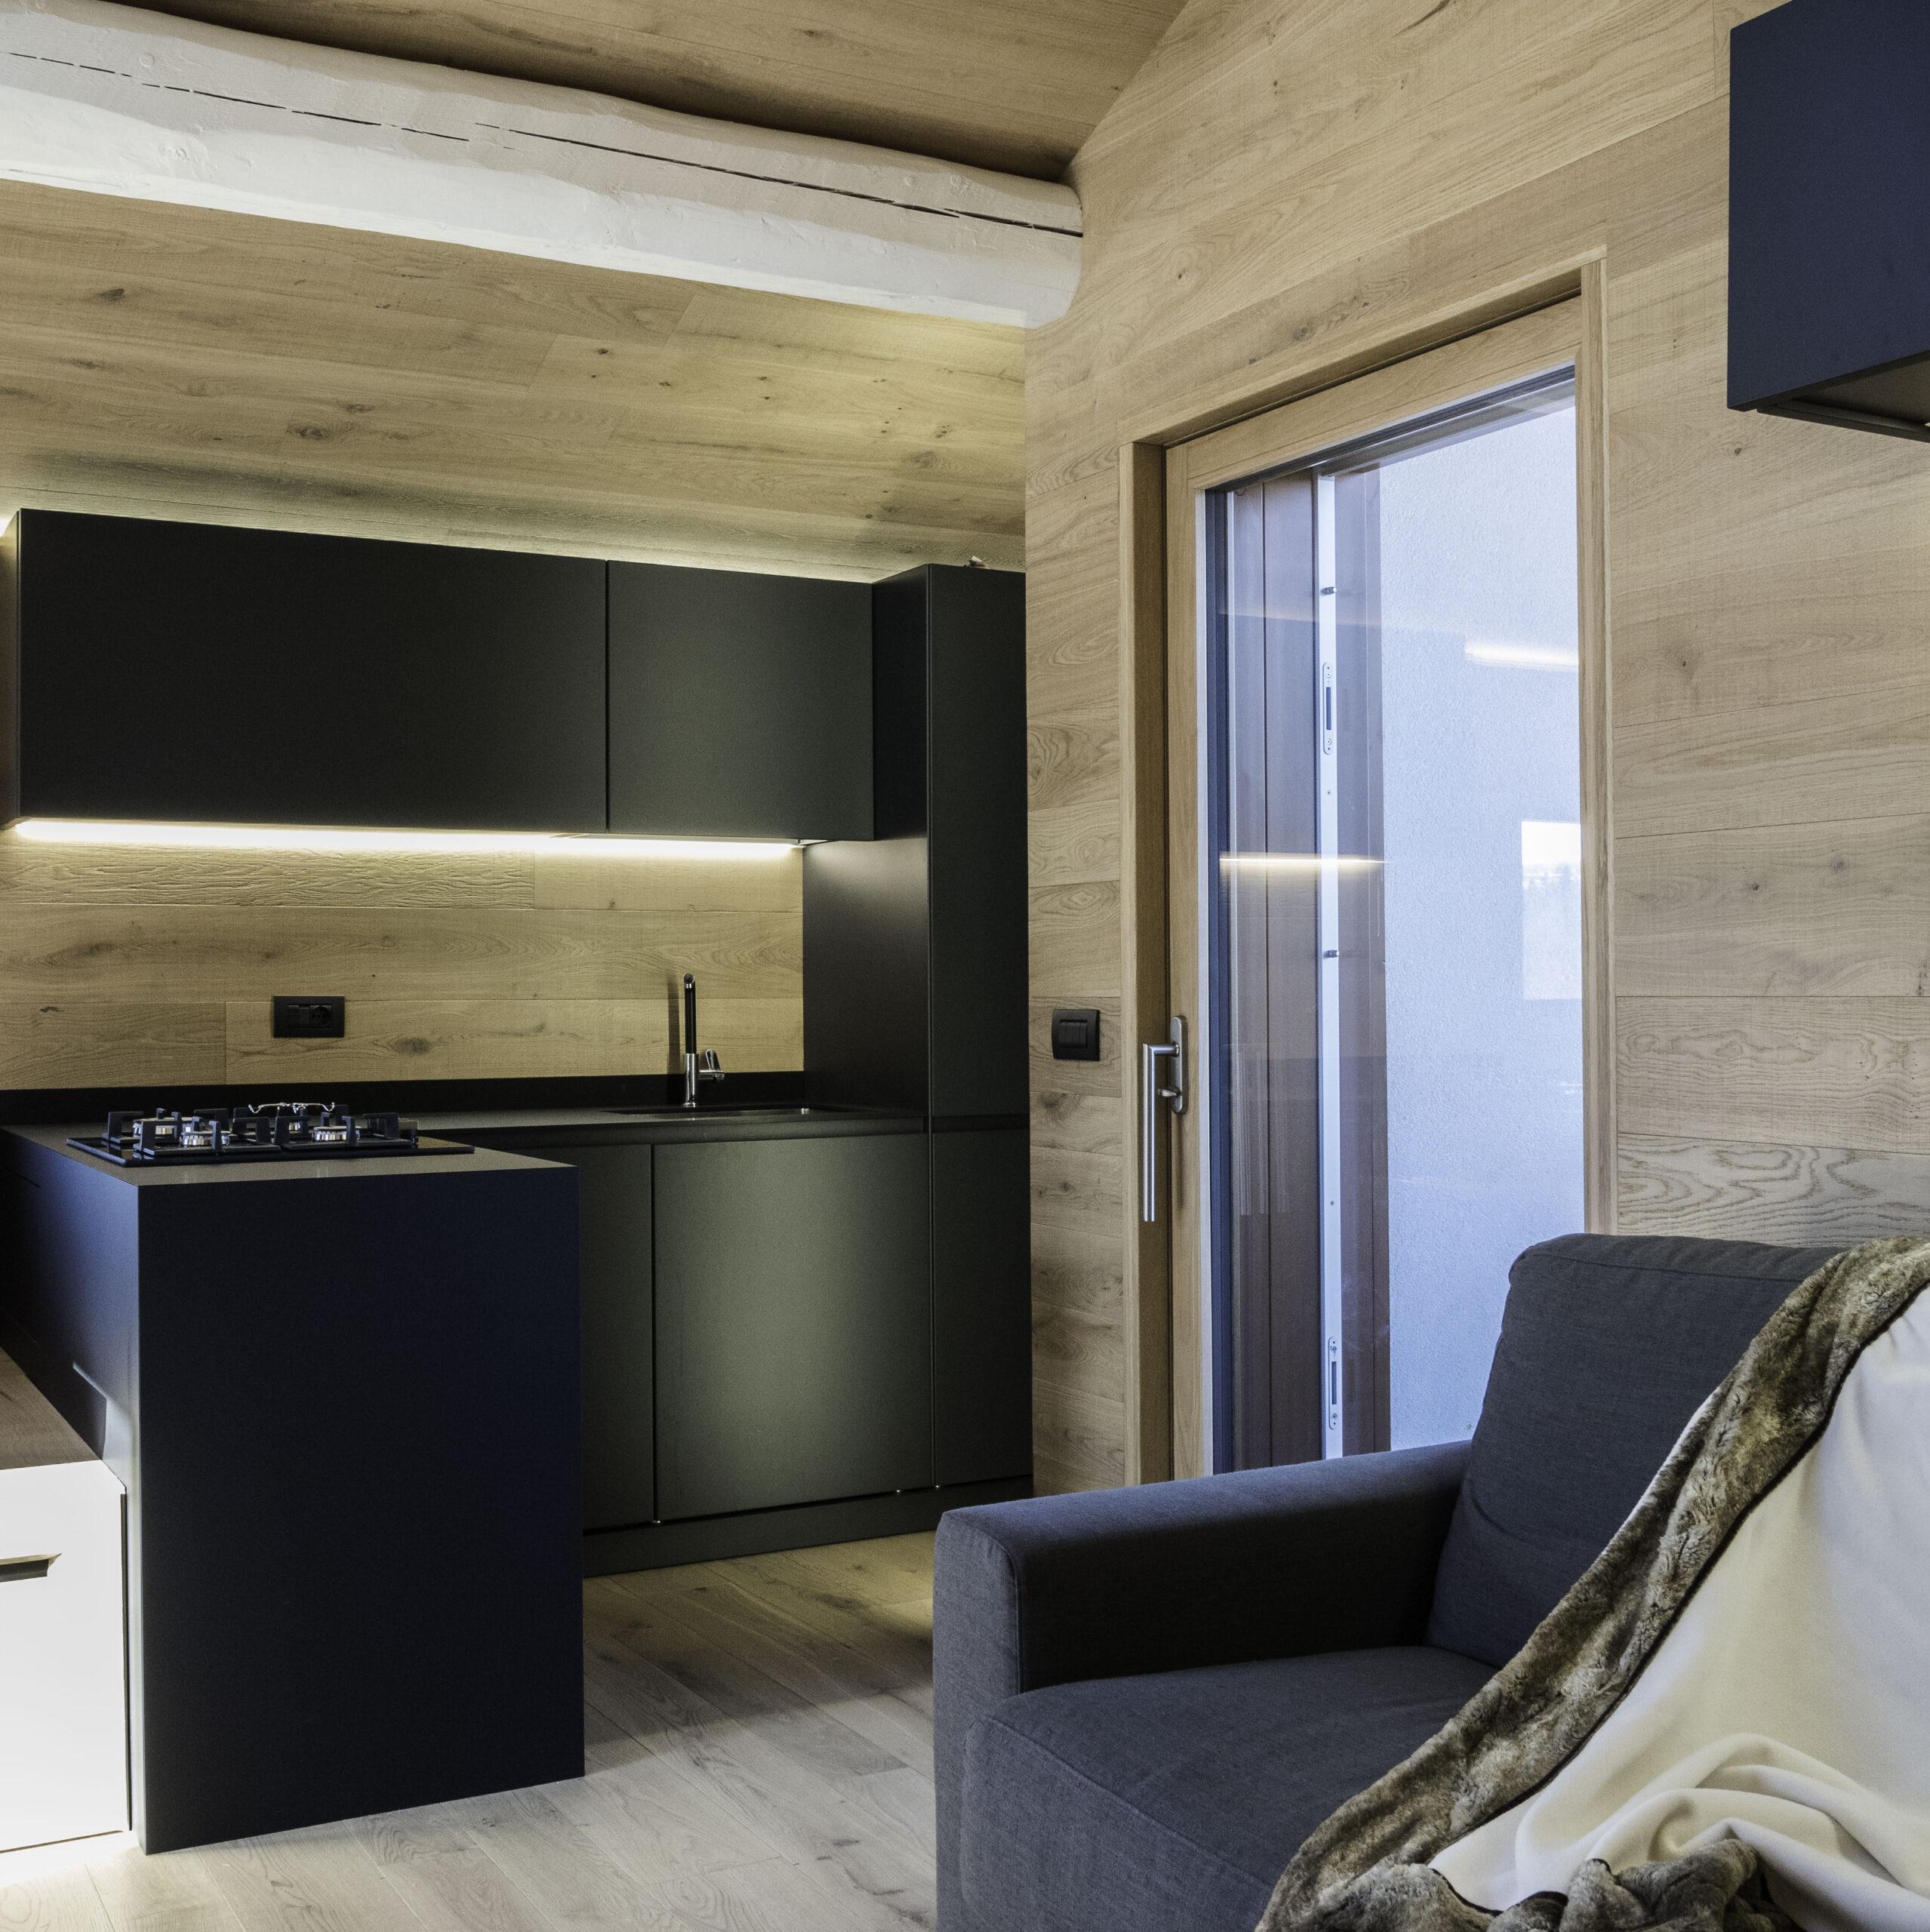 angolo cucina con parquet Rovere Europeo Rusticone